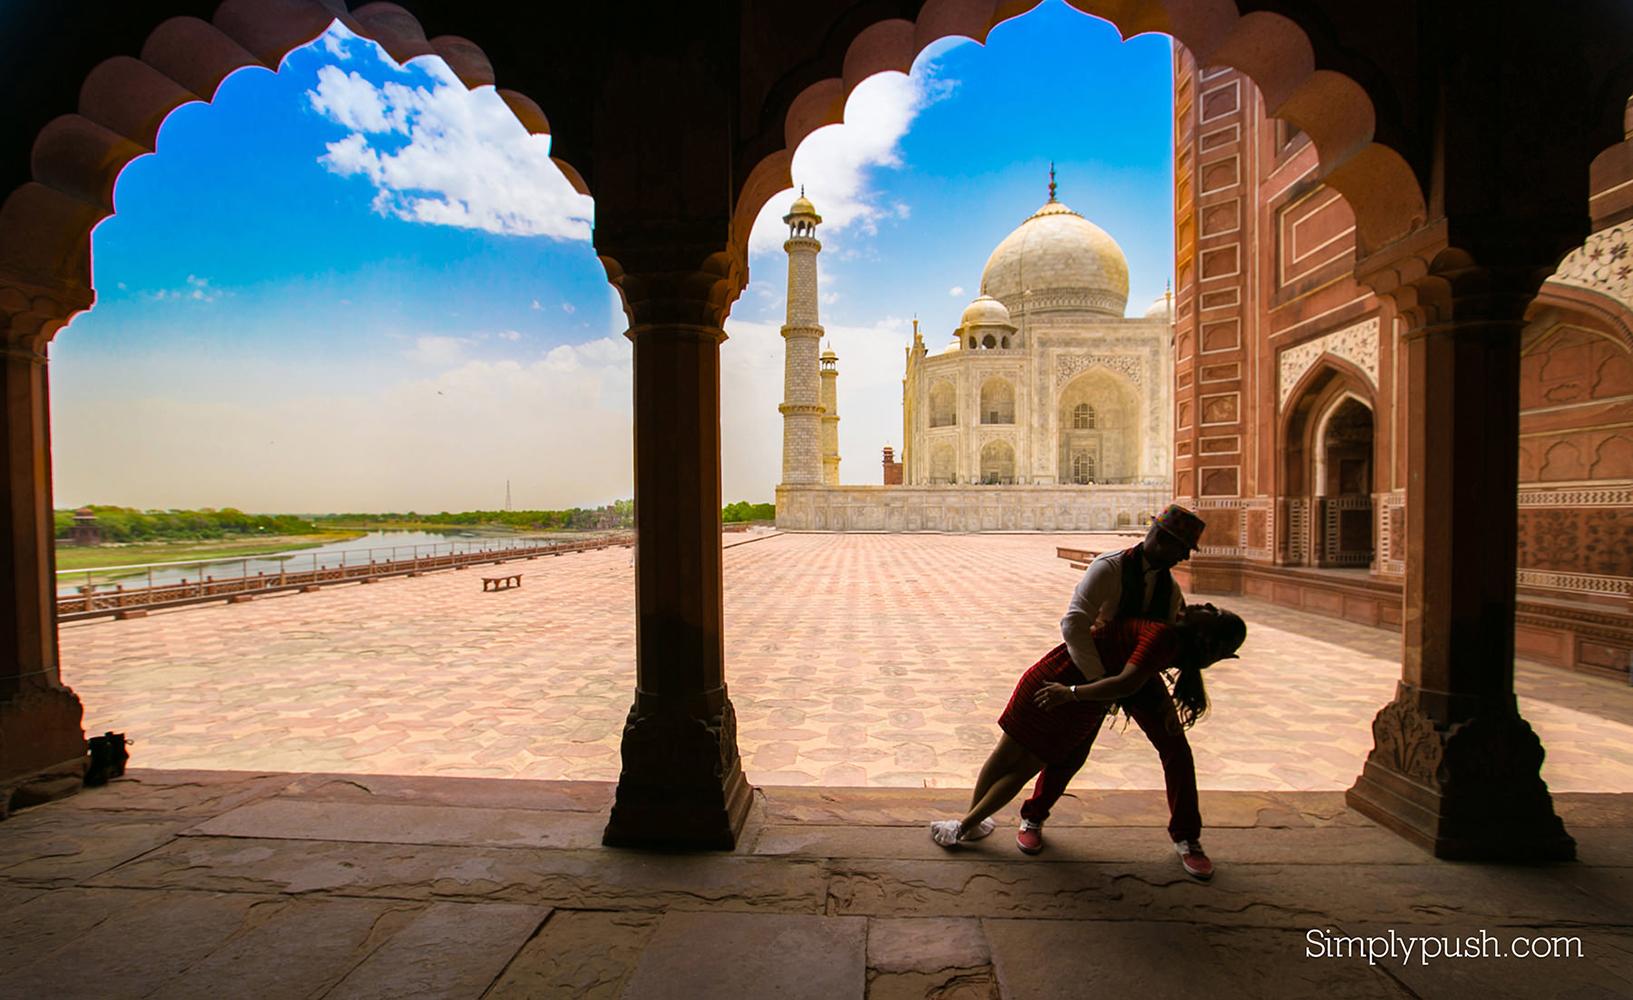 Taj Mahal Photoshoot photographer, photoshoot taj mahal, Pre